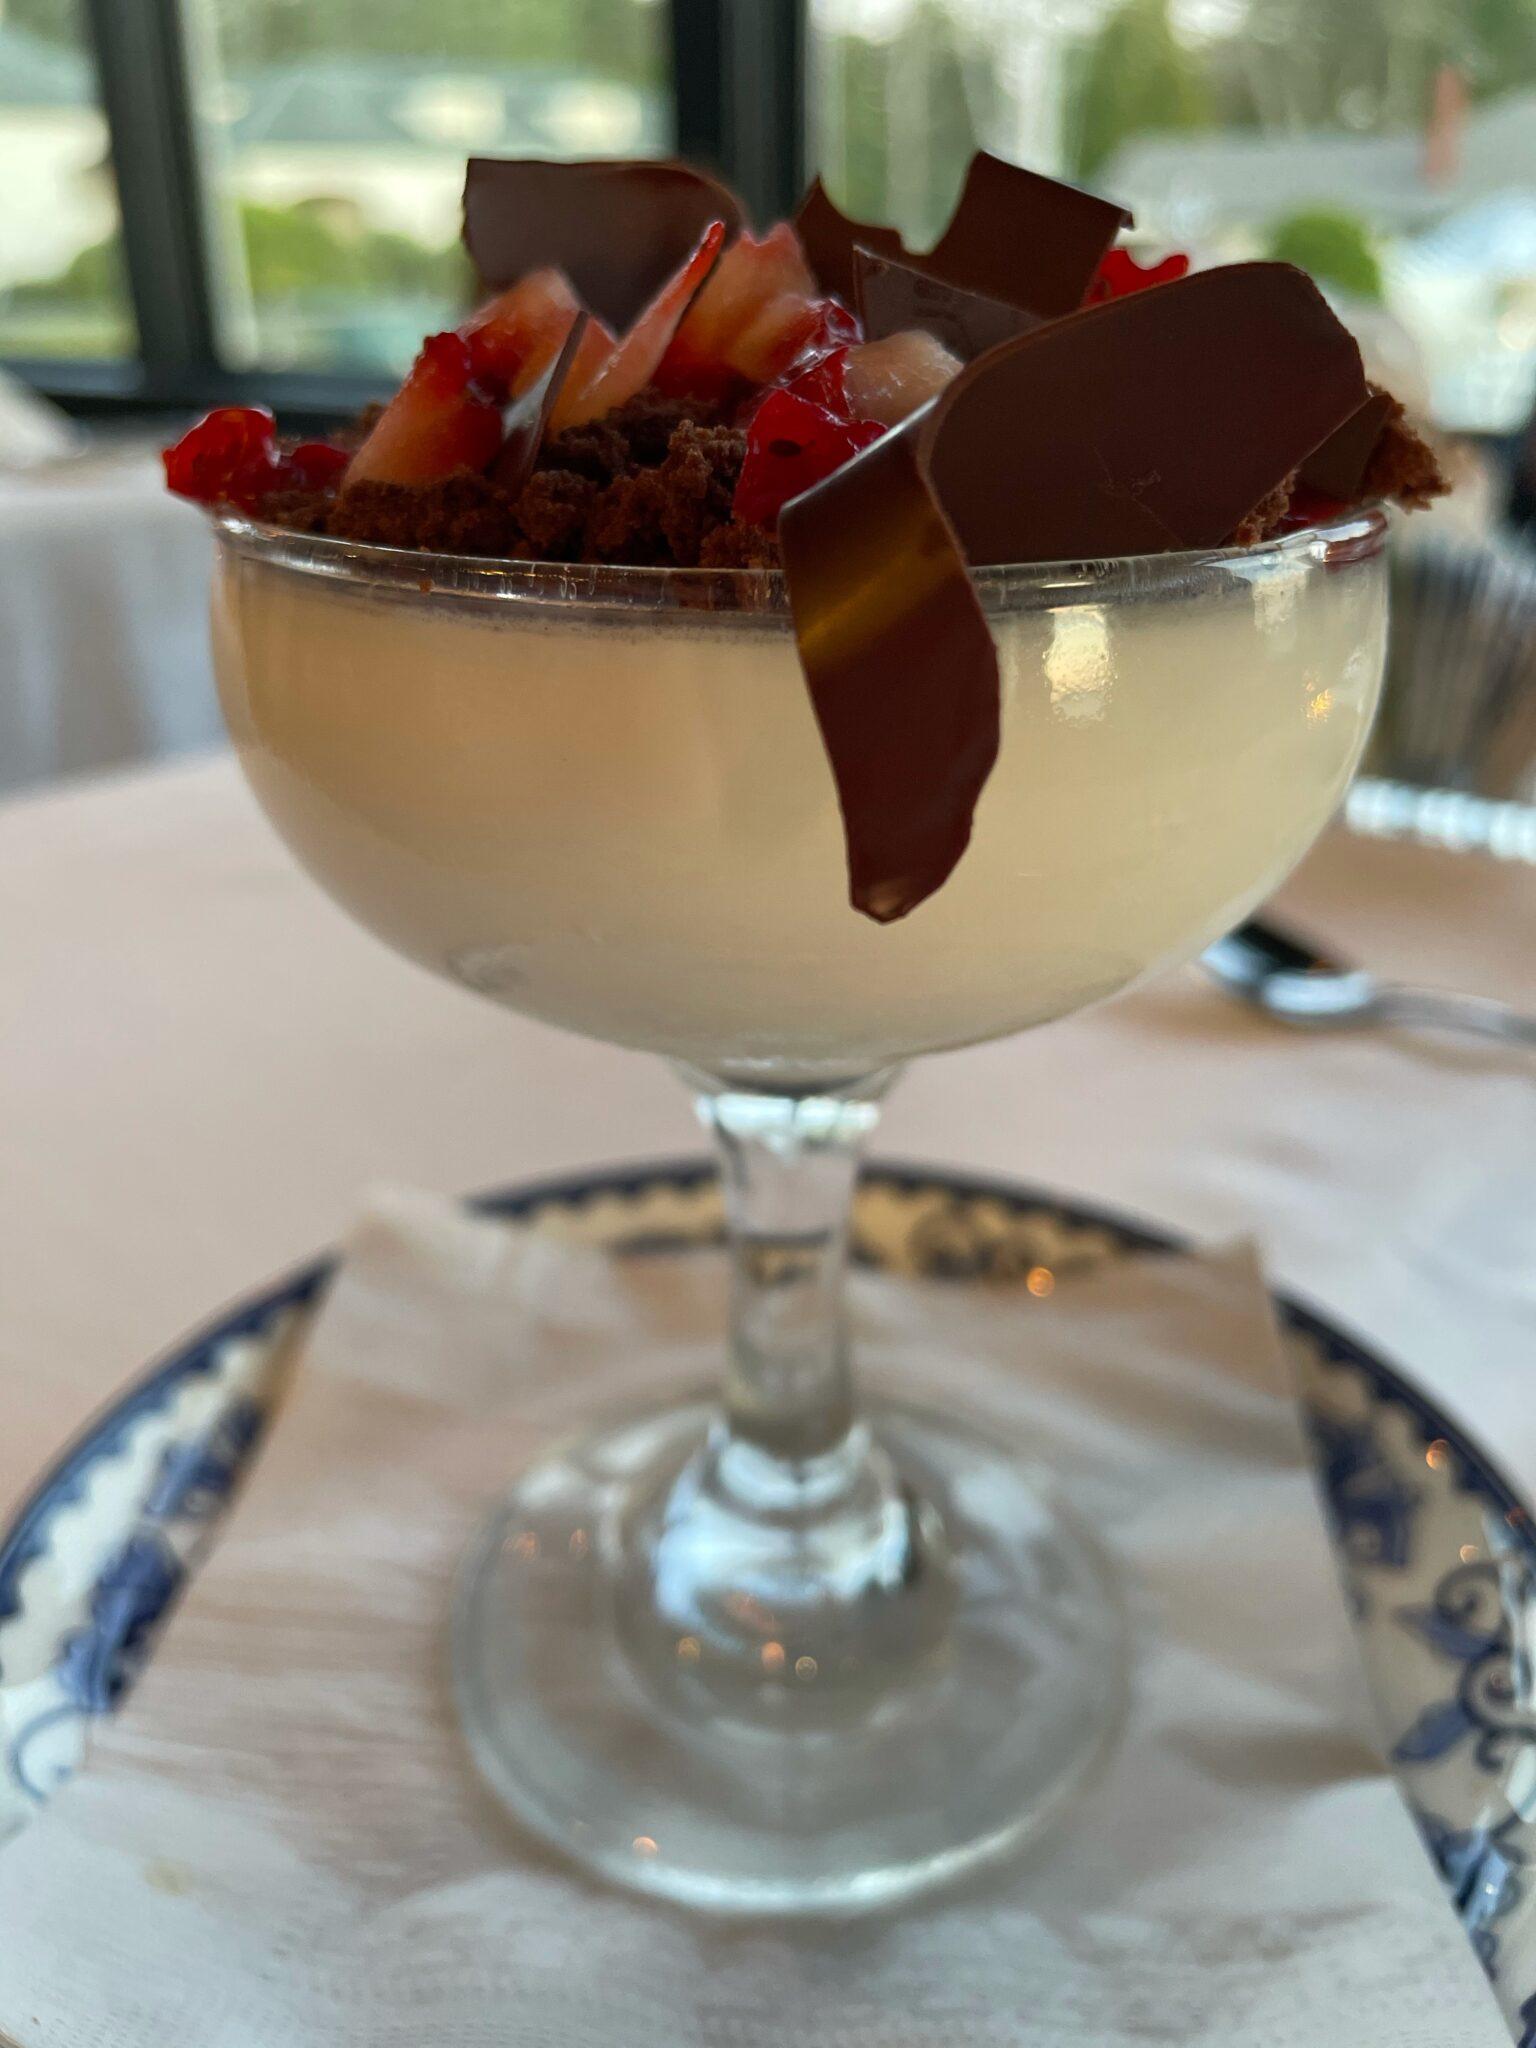 Vanilla Panna Cotta inspired by chocolate covered strawberries